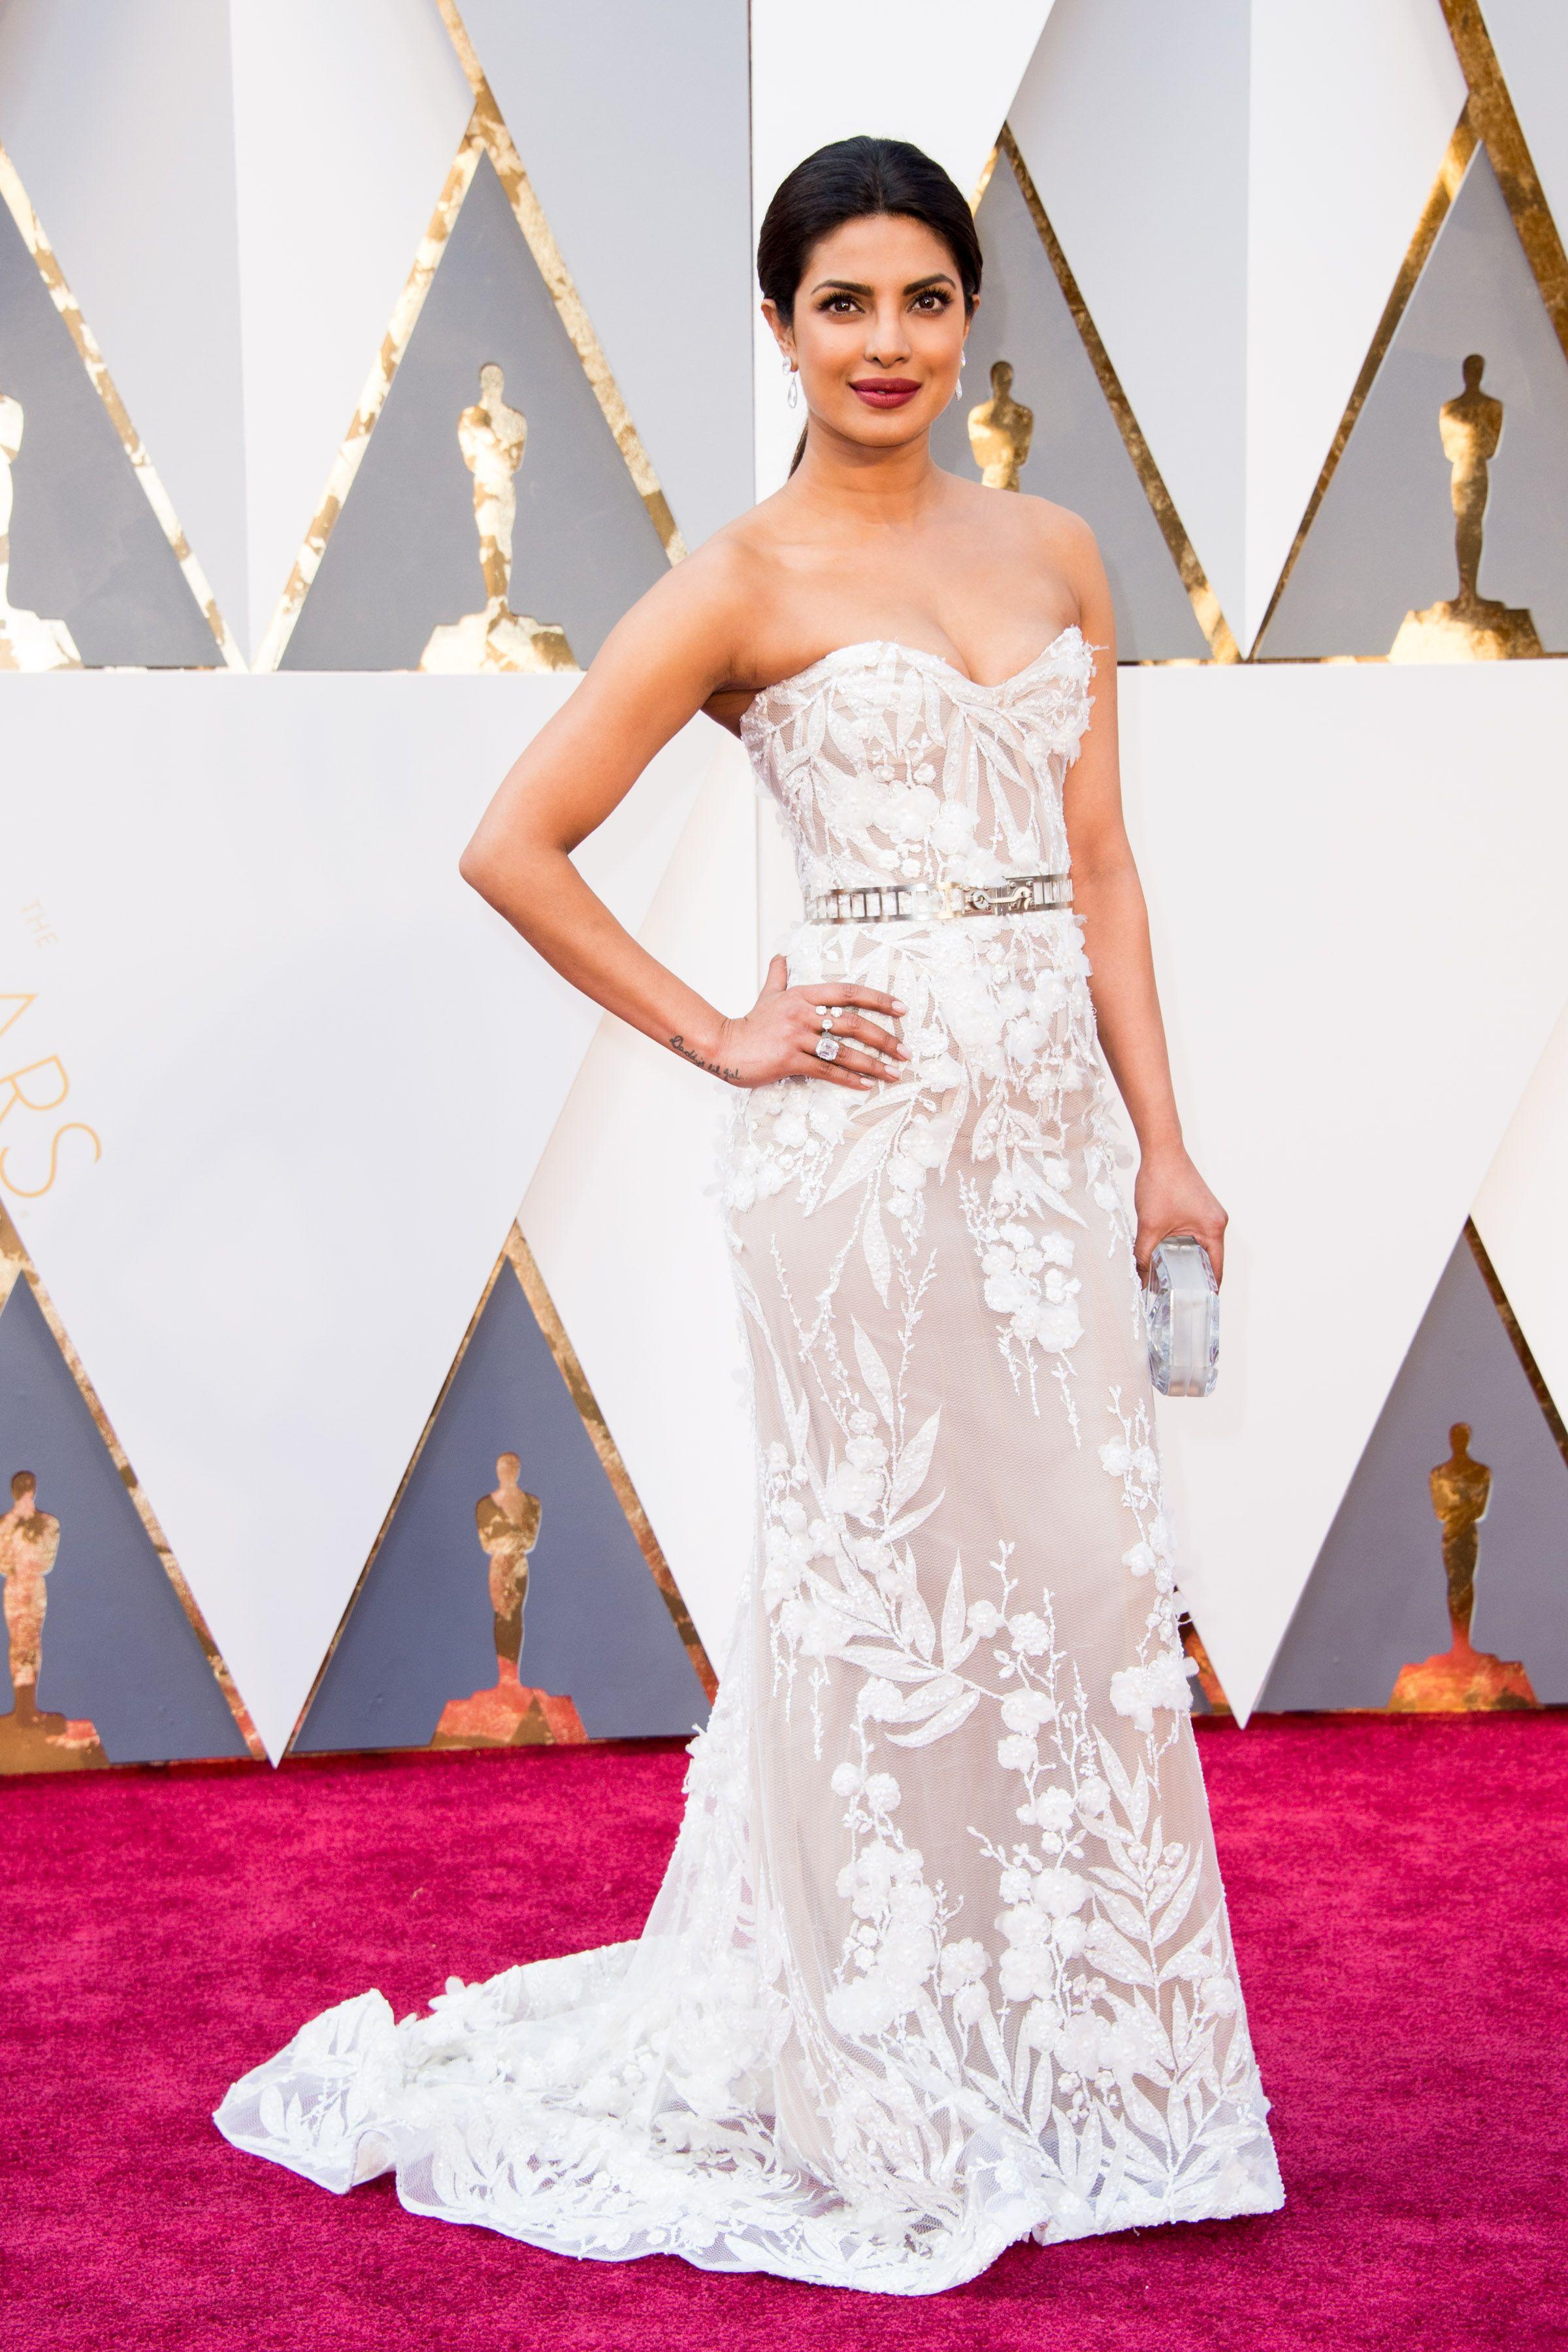 Priyanka Chopra Makes Her Debut On Oscars Red Carpet Fashion Jewelry Voylla Alwaysbeautiful Oscars Red Carpet Dresses Red Carpet Oscars Dresses